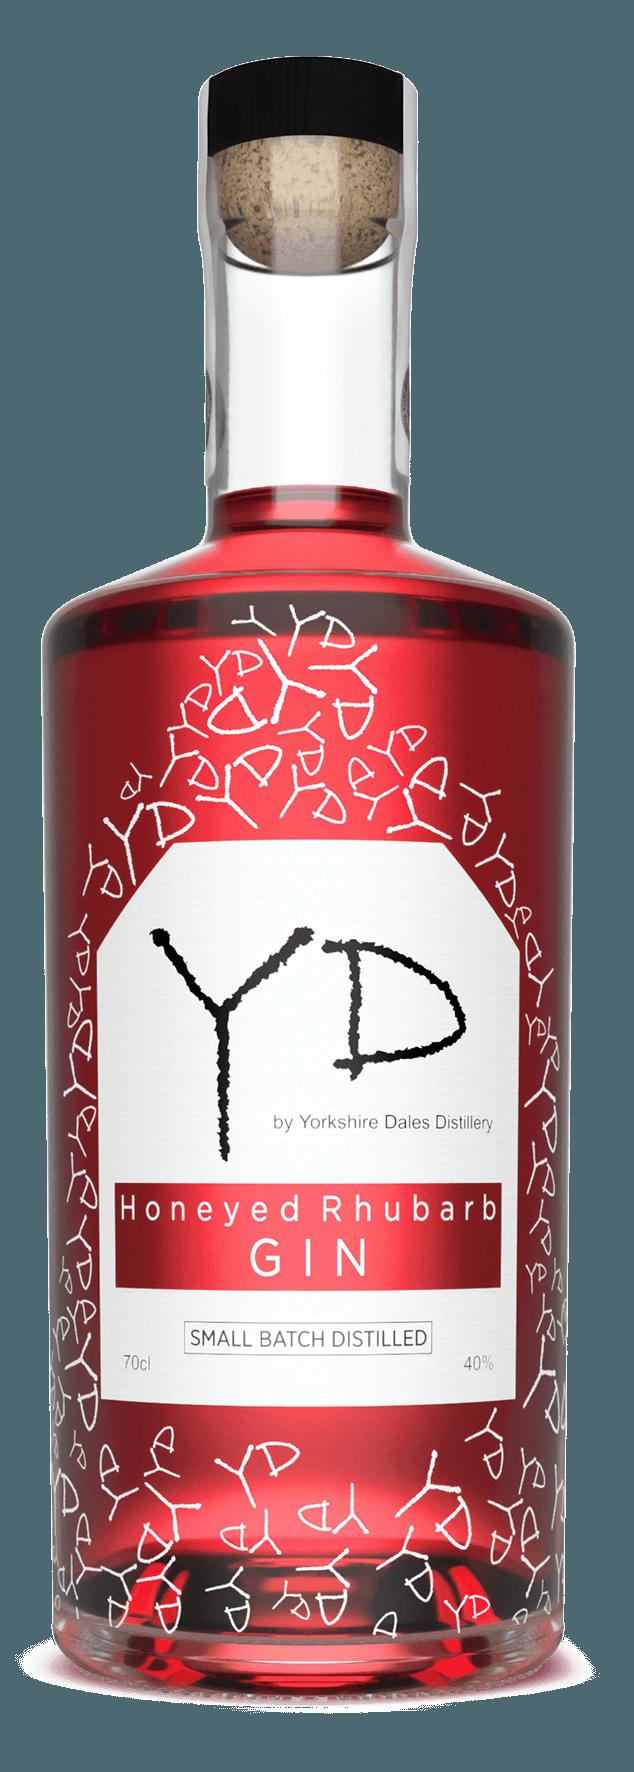 Image 0: Honeyed Rhubarb Gin